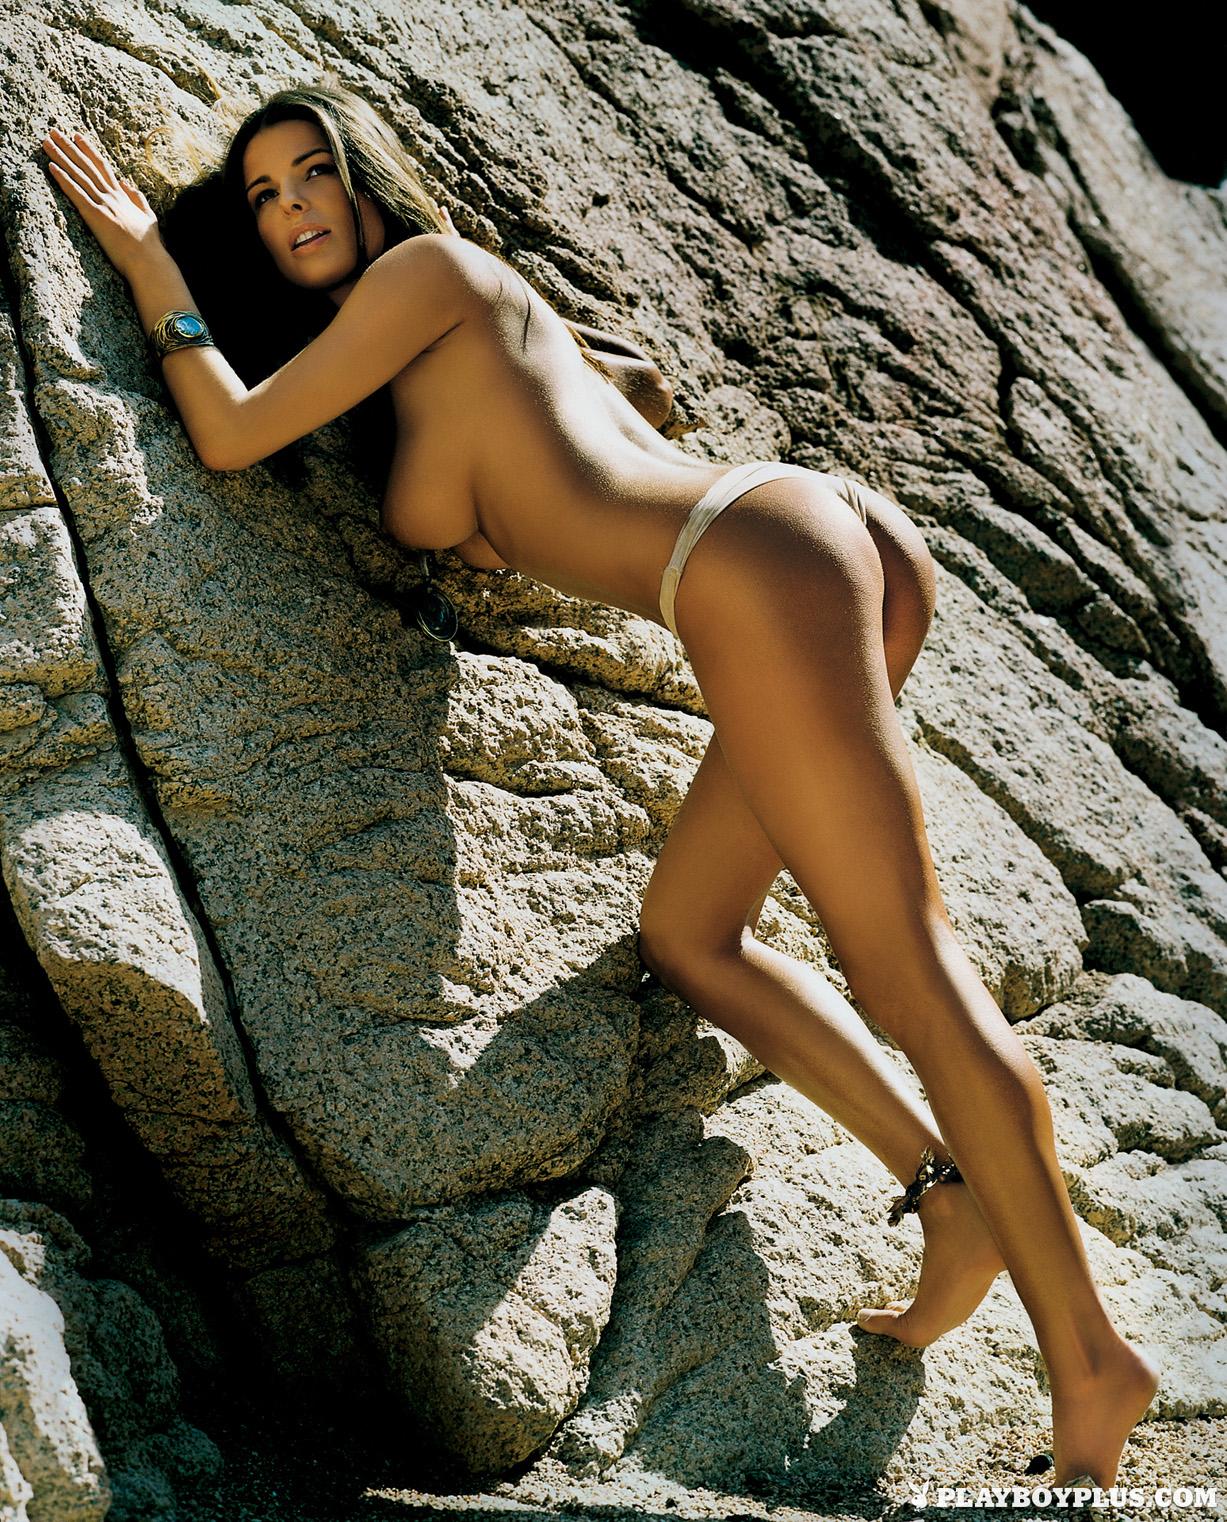 Девушка года Эла Корчовска / Ela Korczowska - Playboy Poland june 2005